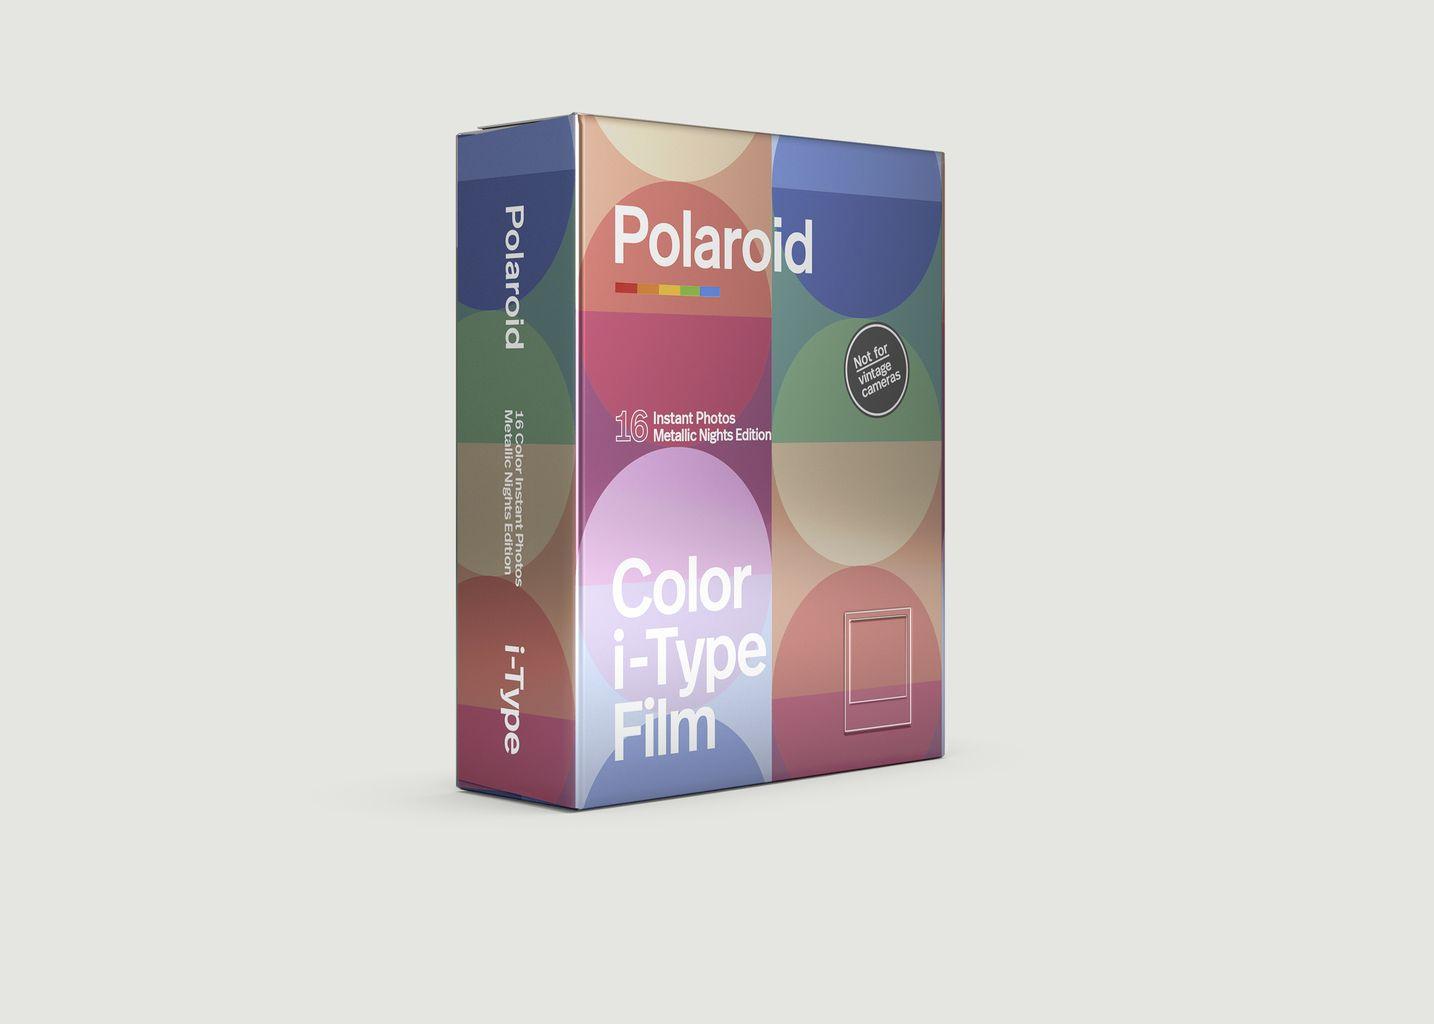 Film I-Type – MetallicNights Double Pack - Polaroid Originals